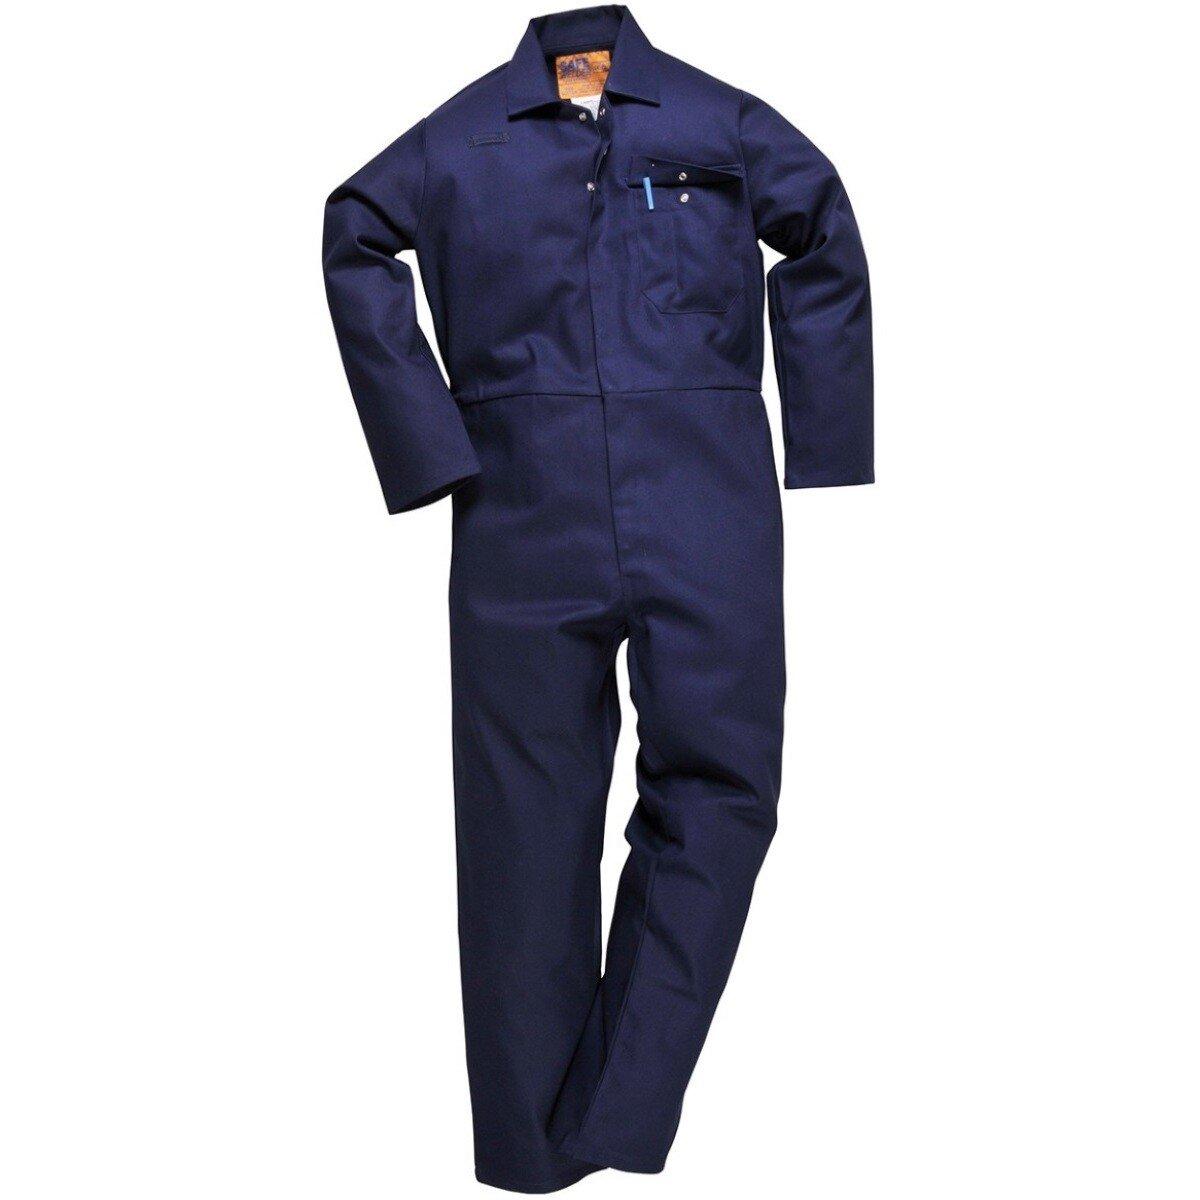 Portwest C030 Flame Retardant CE Safe Welder Coverall Boiler Suit